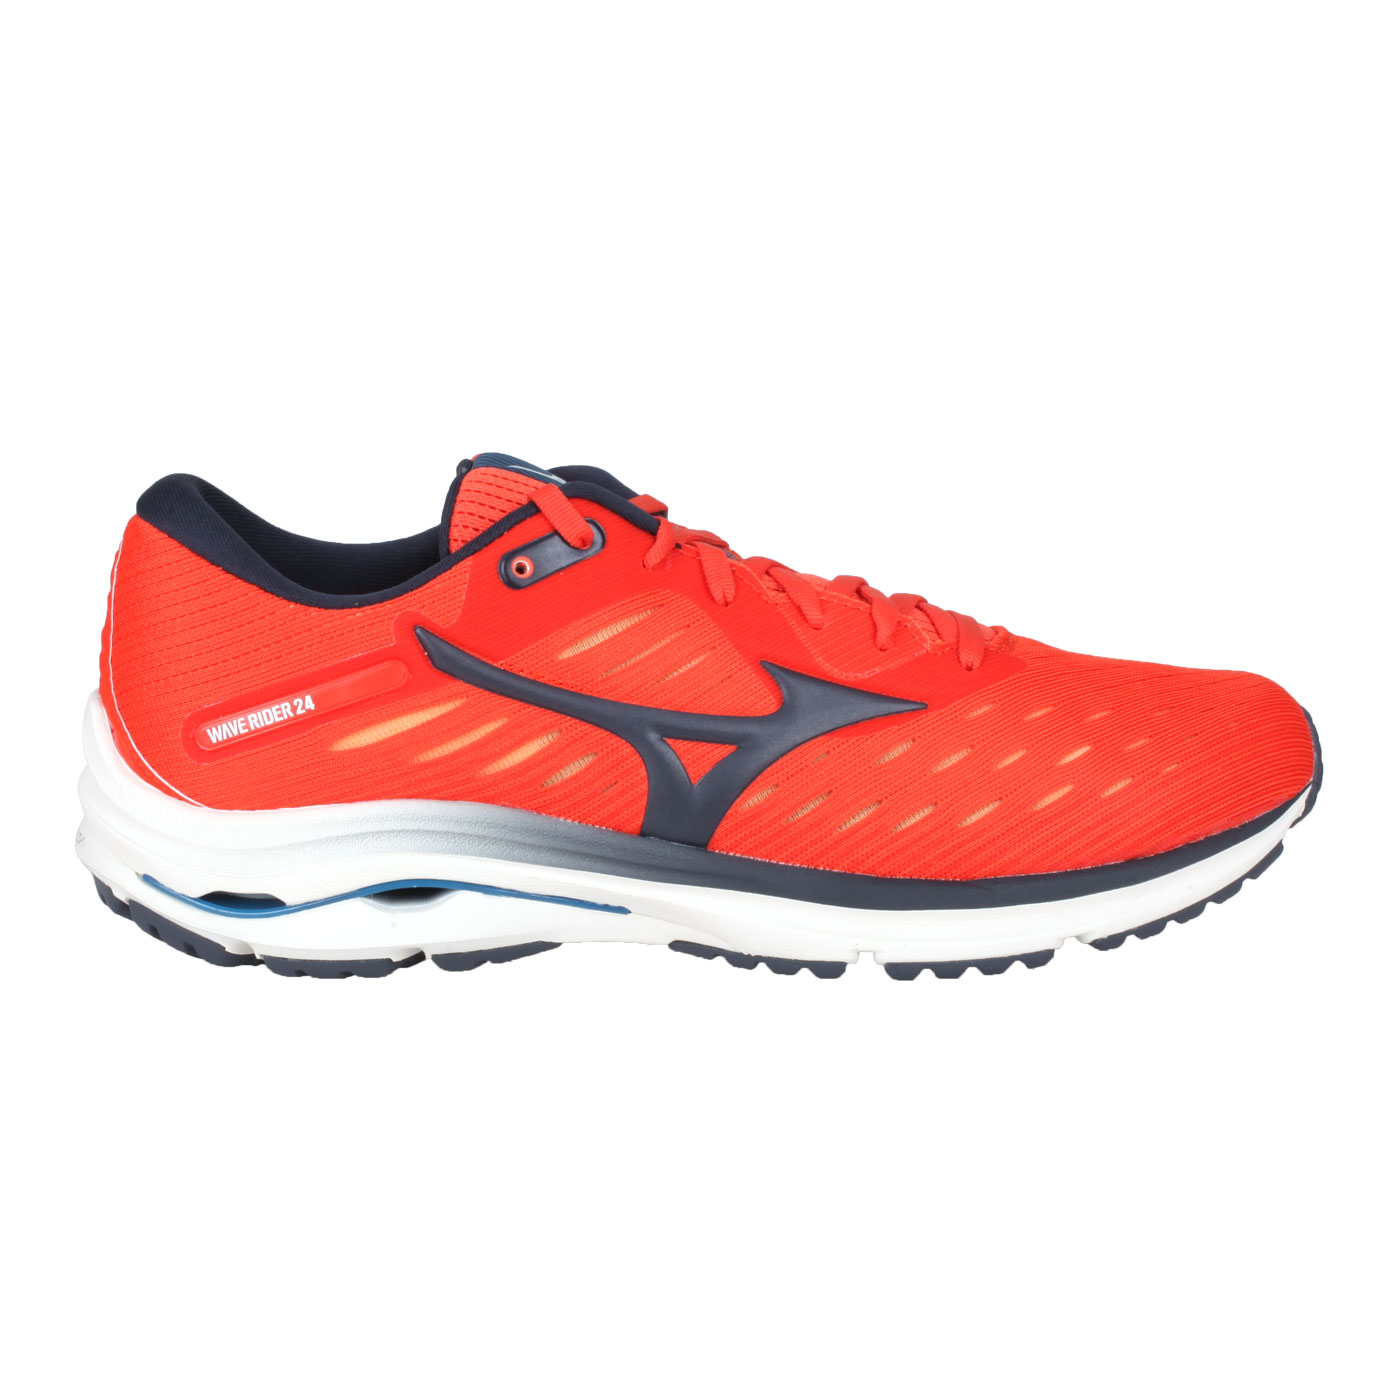 MIZUNO 男慢跑鞋  @WAVE RIDER 24@J1GC200330 - 橘紅黑